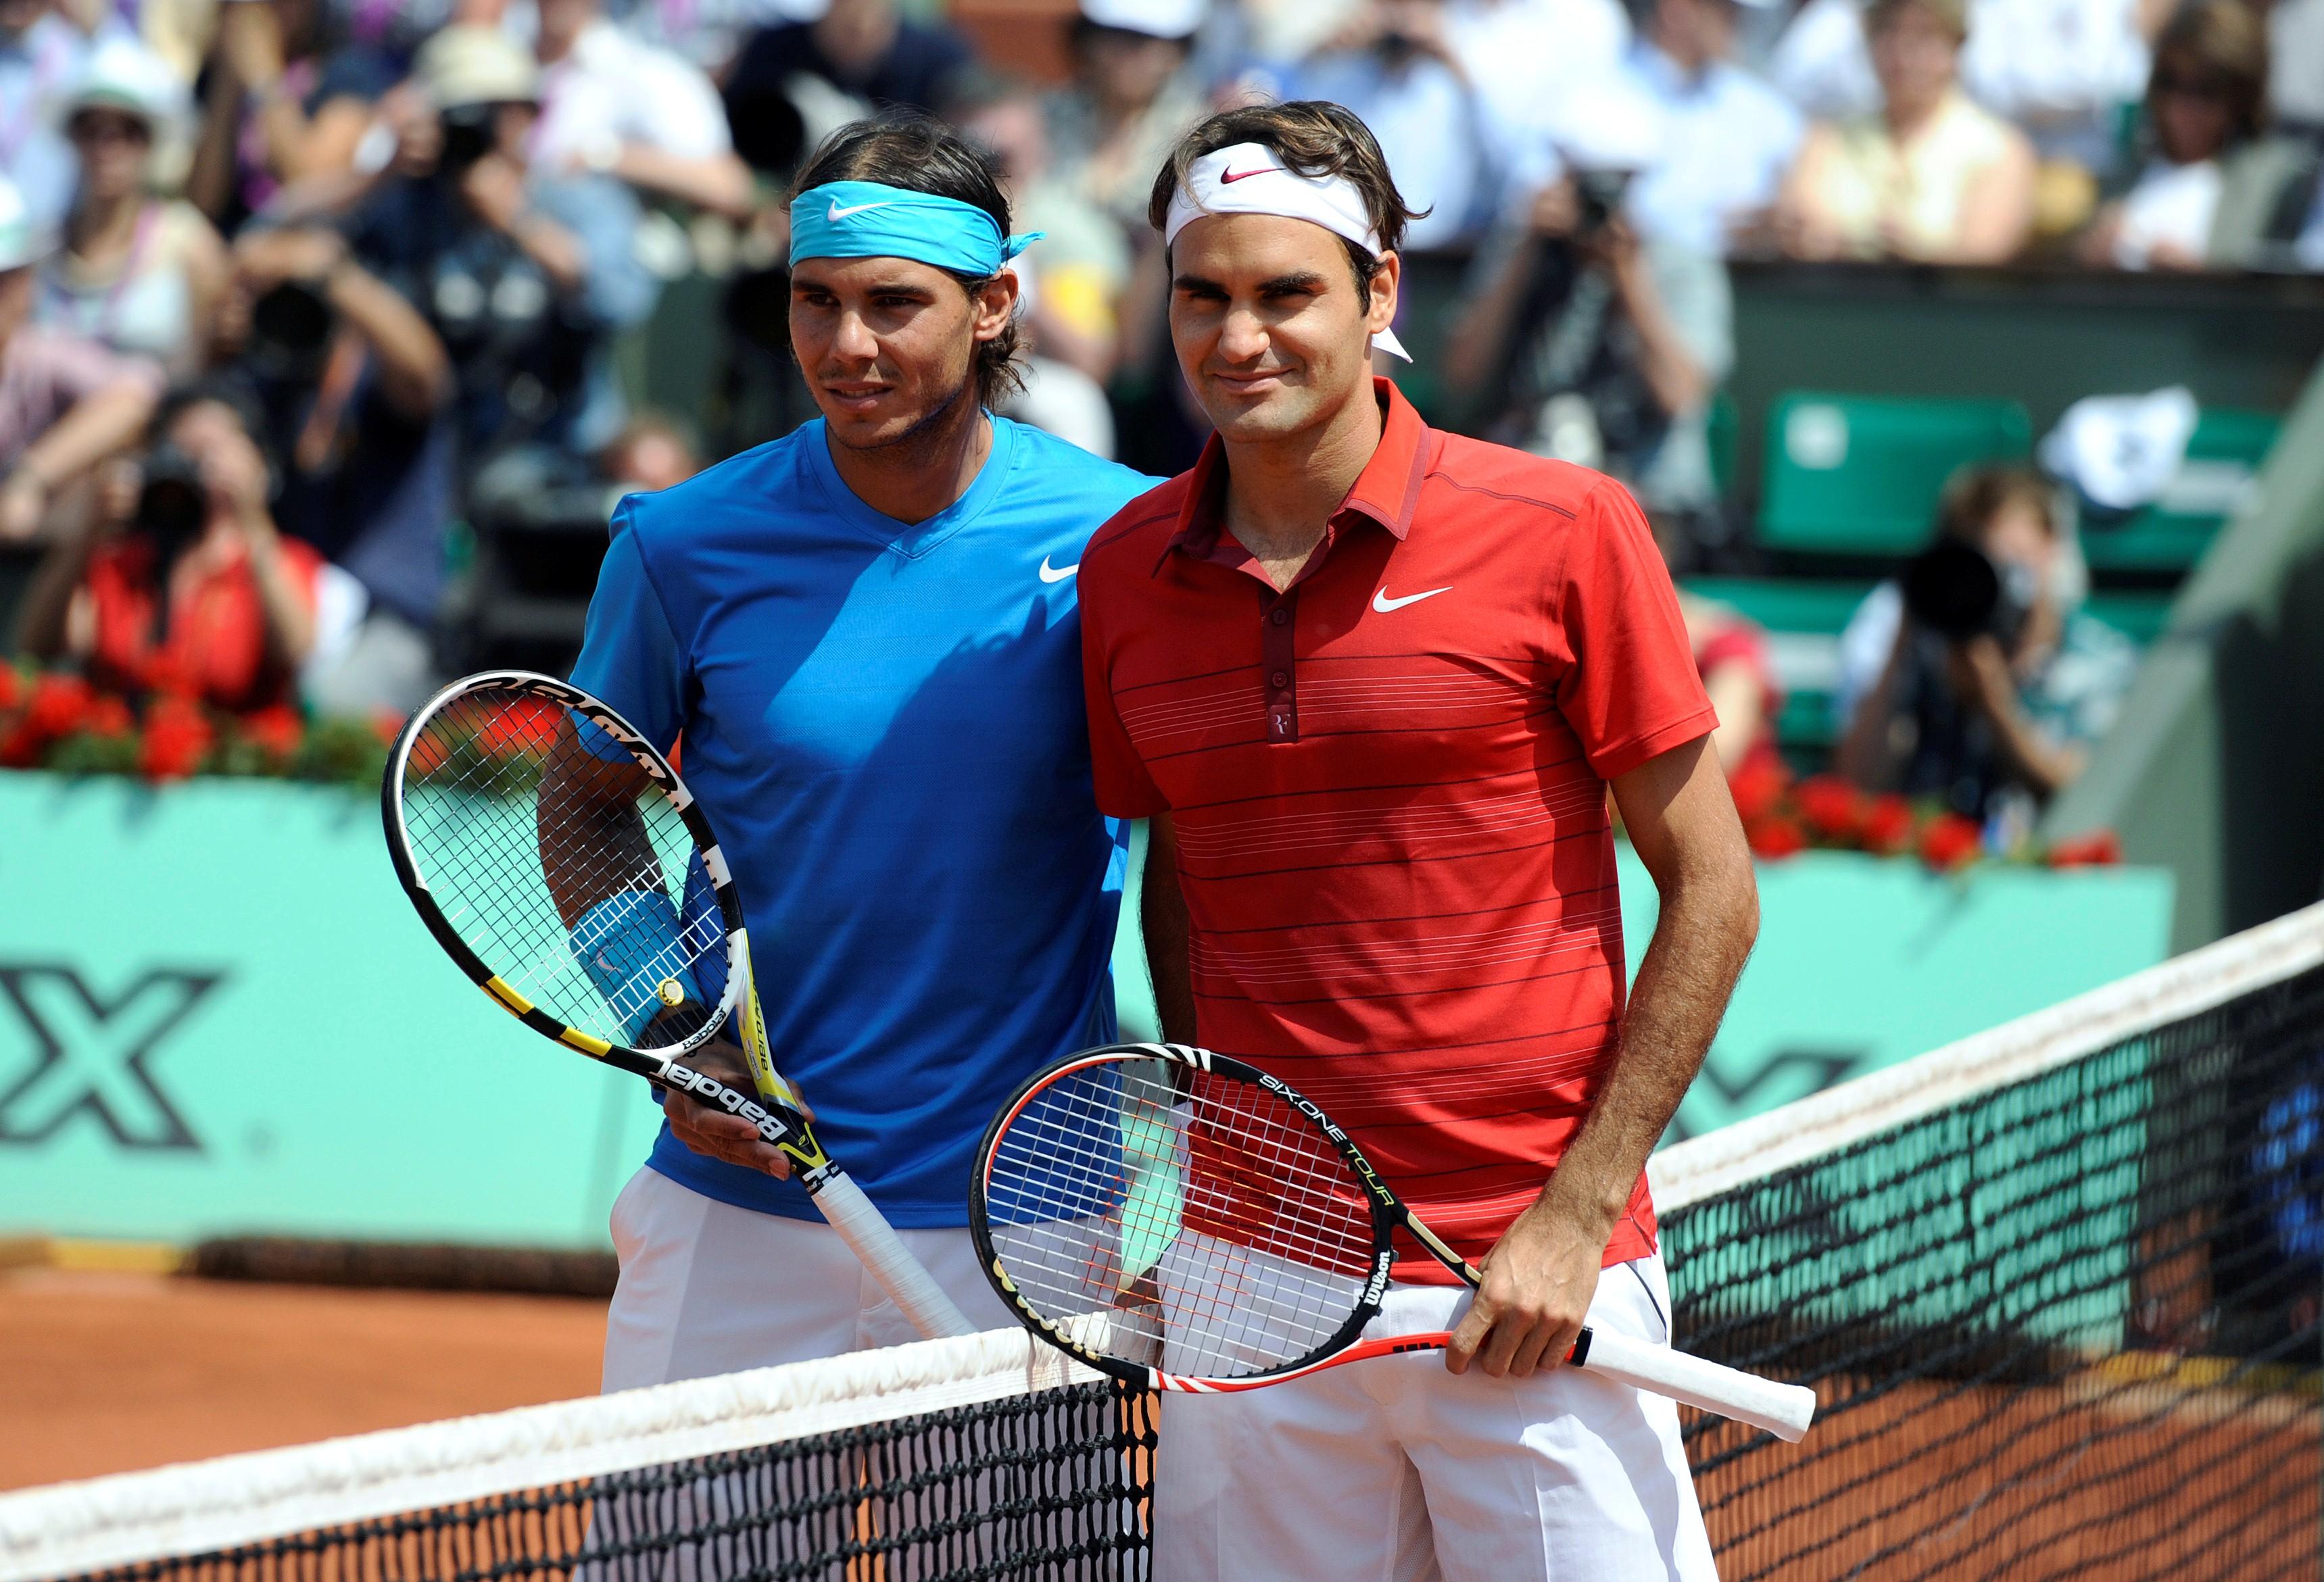 Roger Federer et Rafael Nadal avant la finale de Roland Garros en 2011